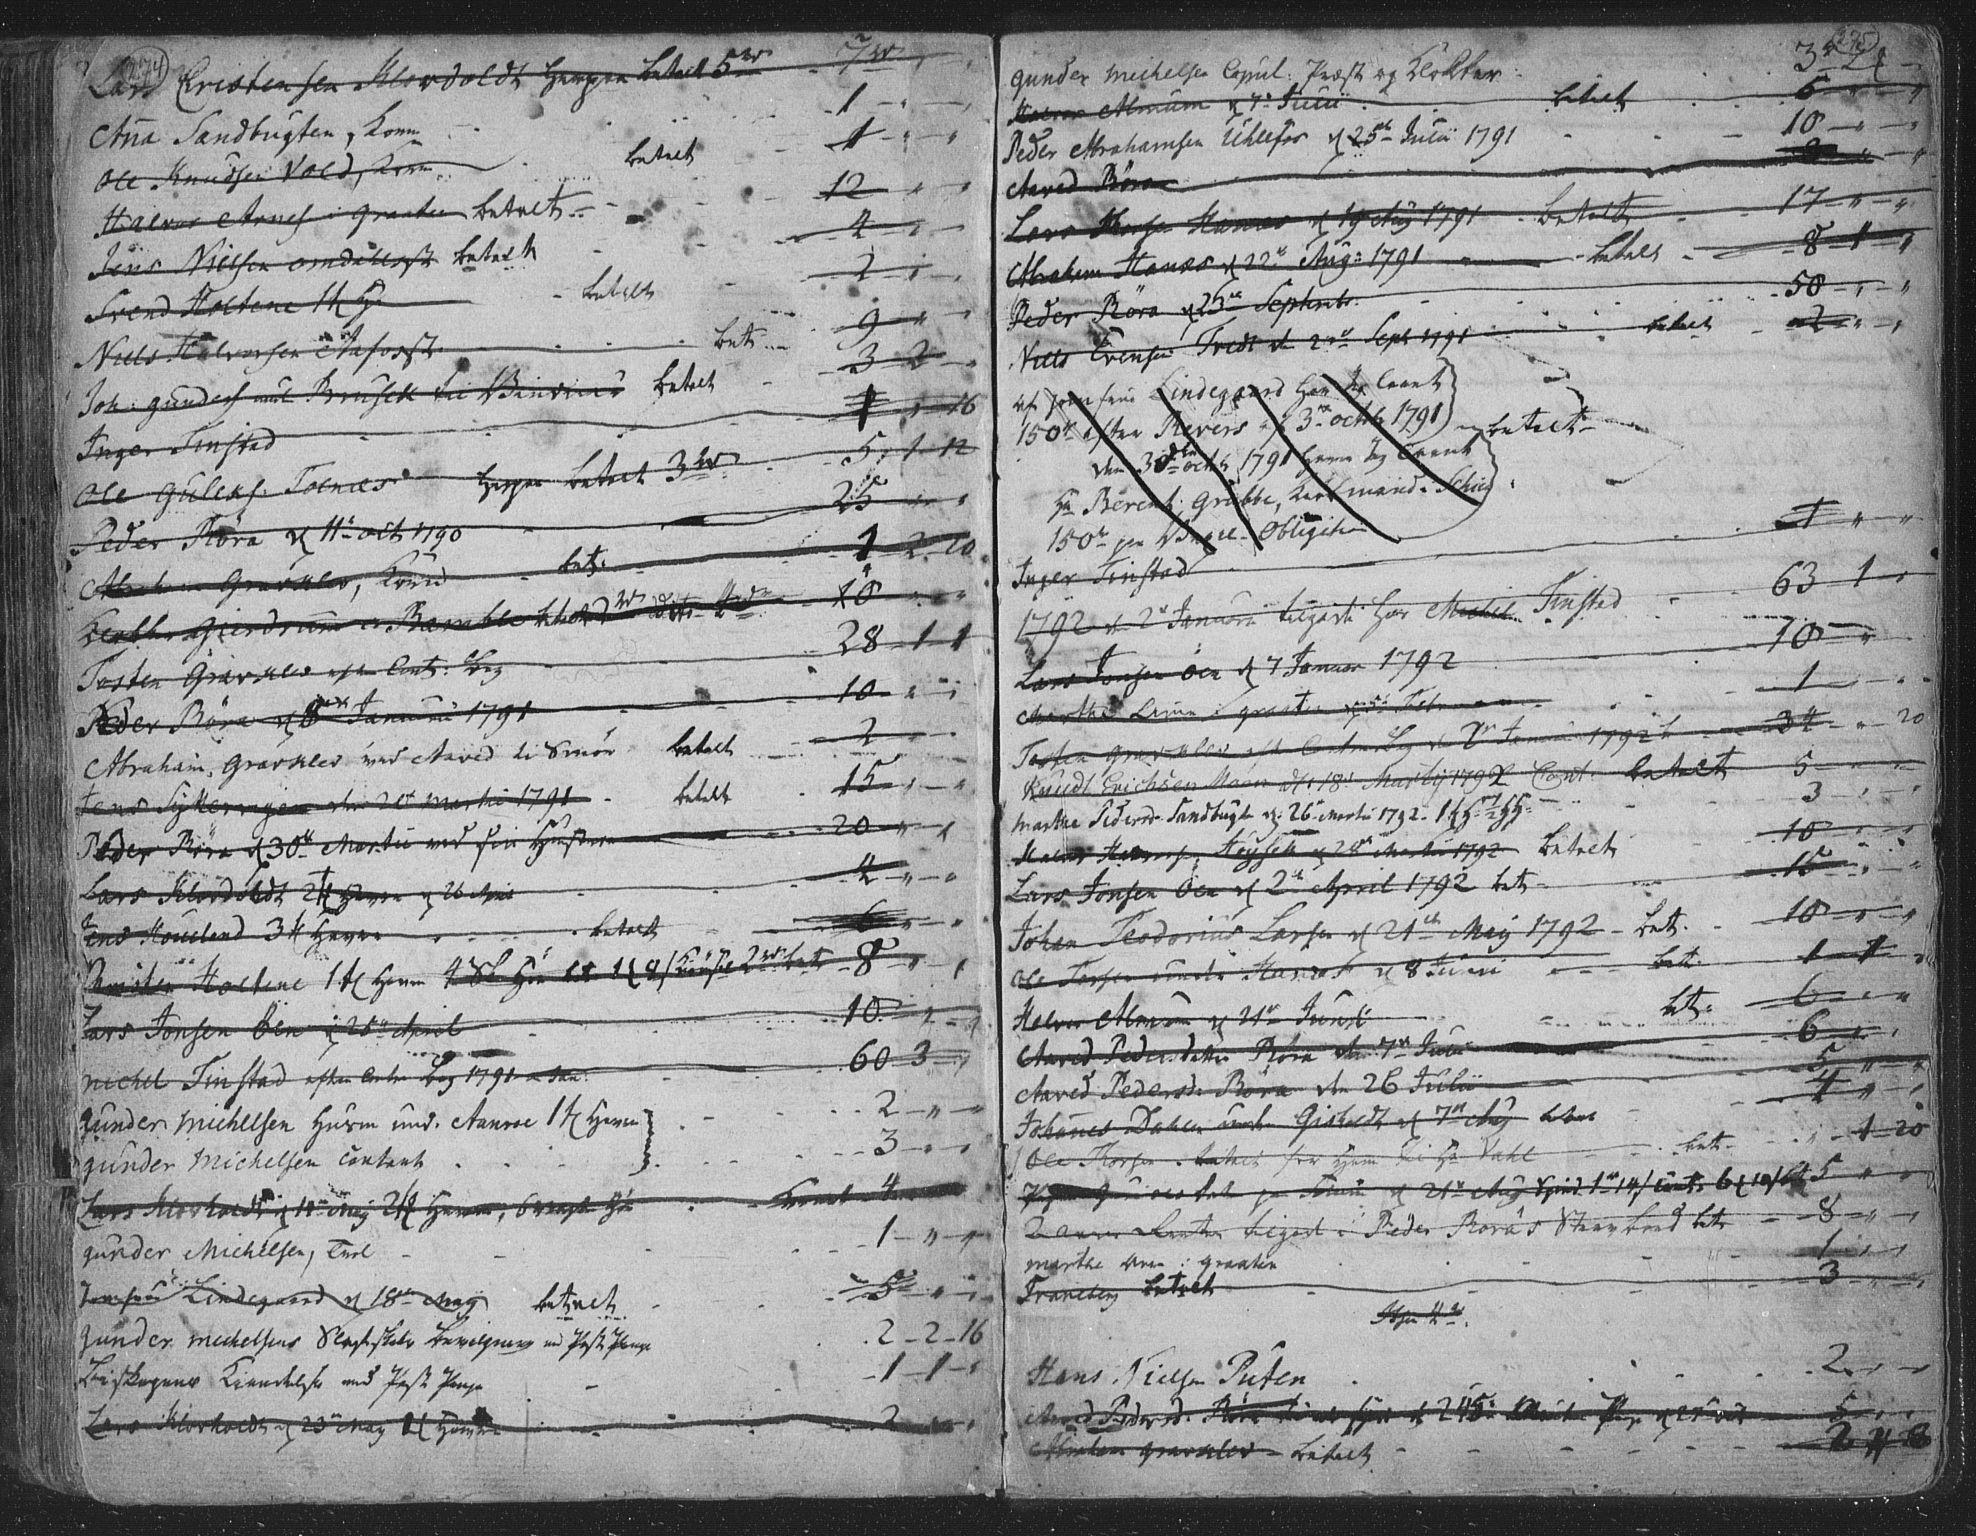 SAKO, Solum kirkebøker, F/Fa/L0003: Ministerialbok nr. I 3, 1761-1814, s. 274-275